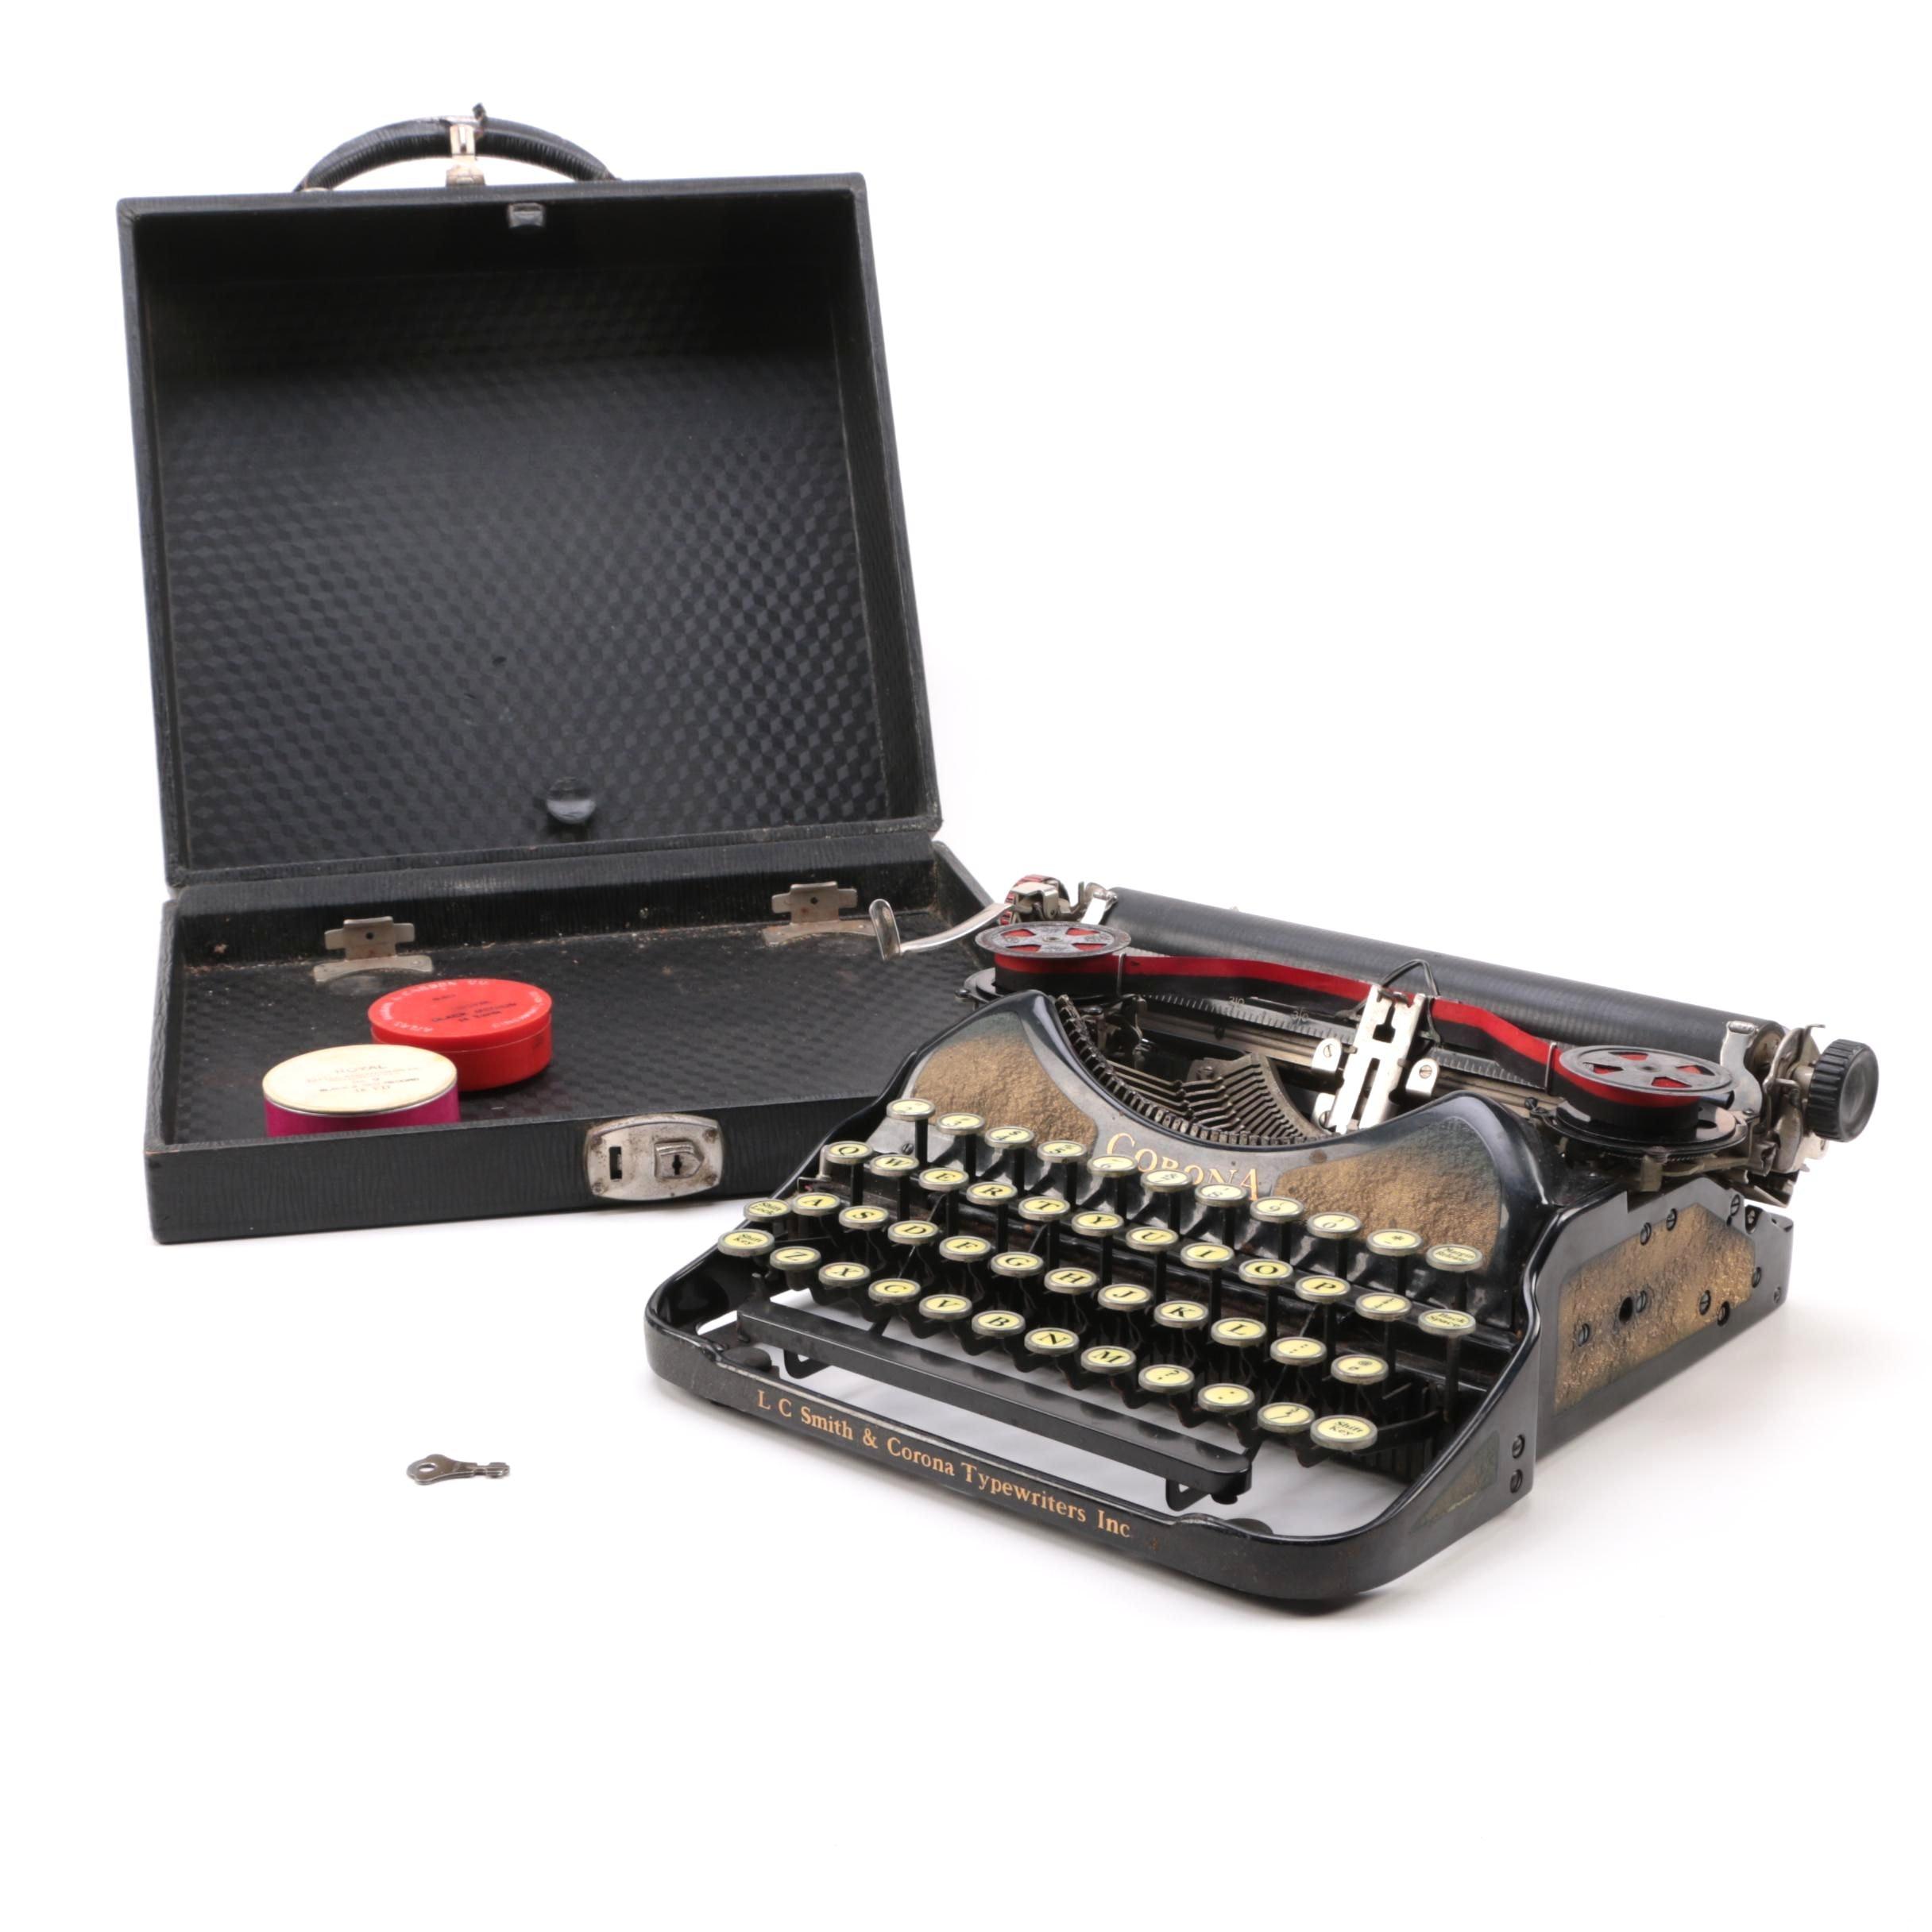 Vintage Corona Typewriter with Case